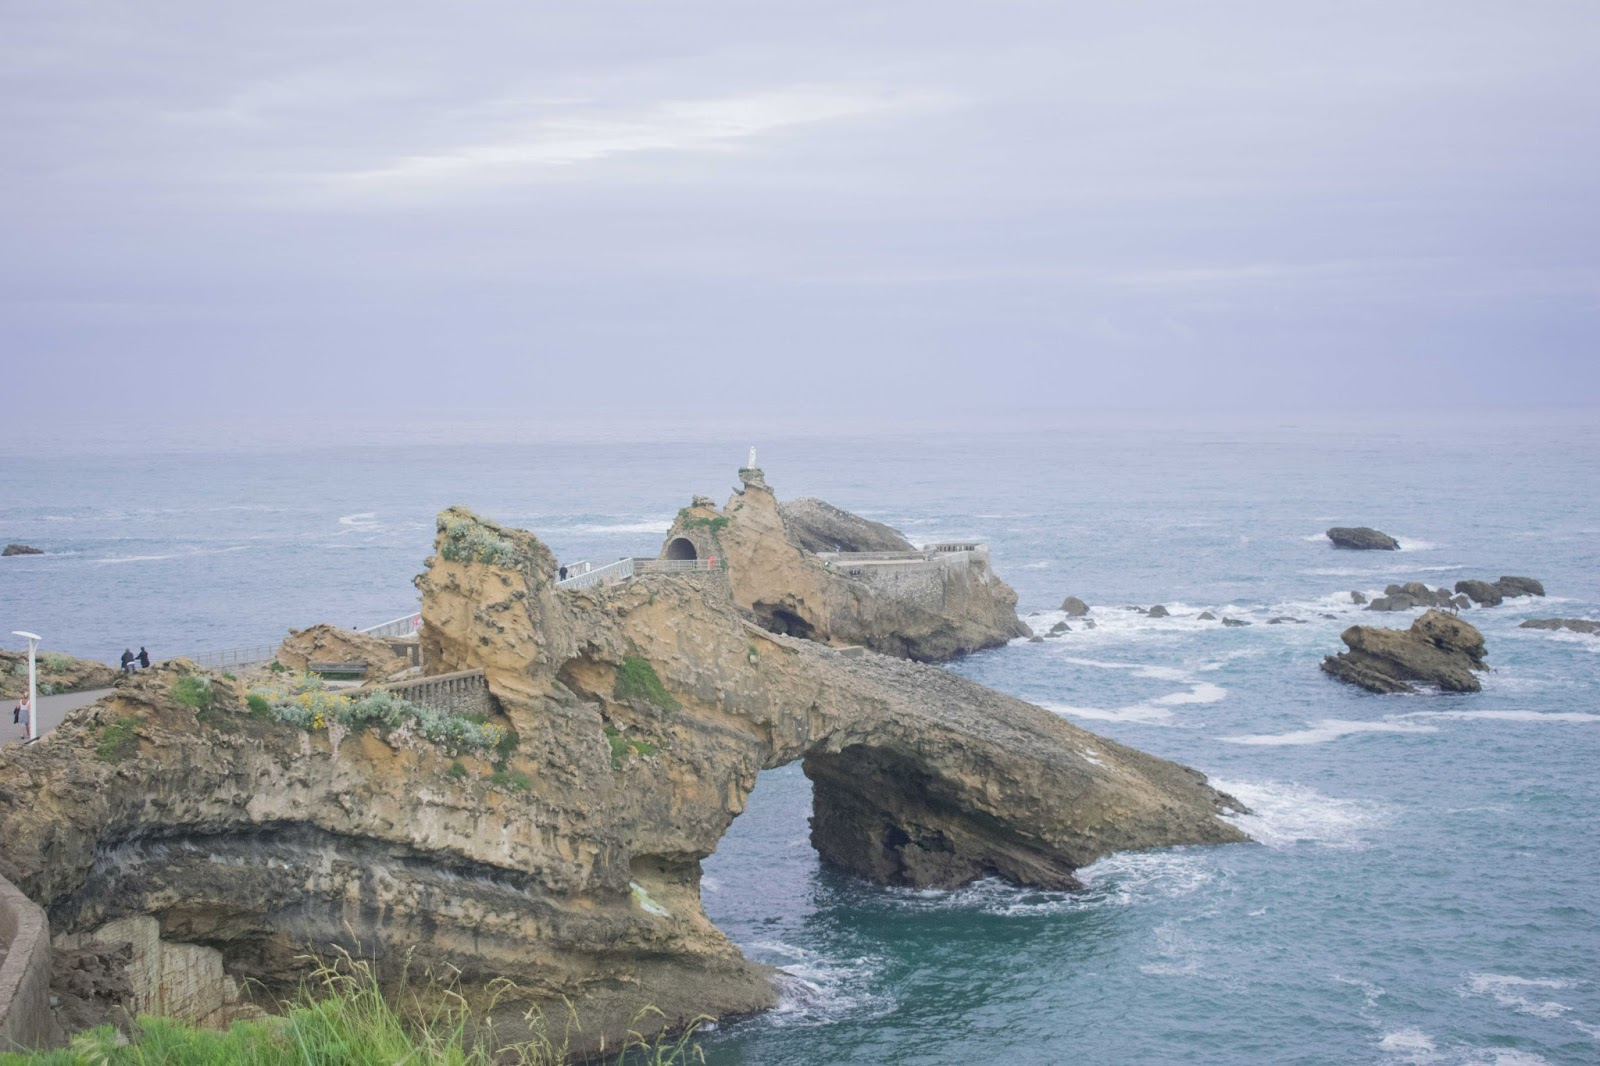 rocher, océan, vague, vierge